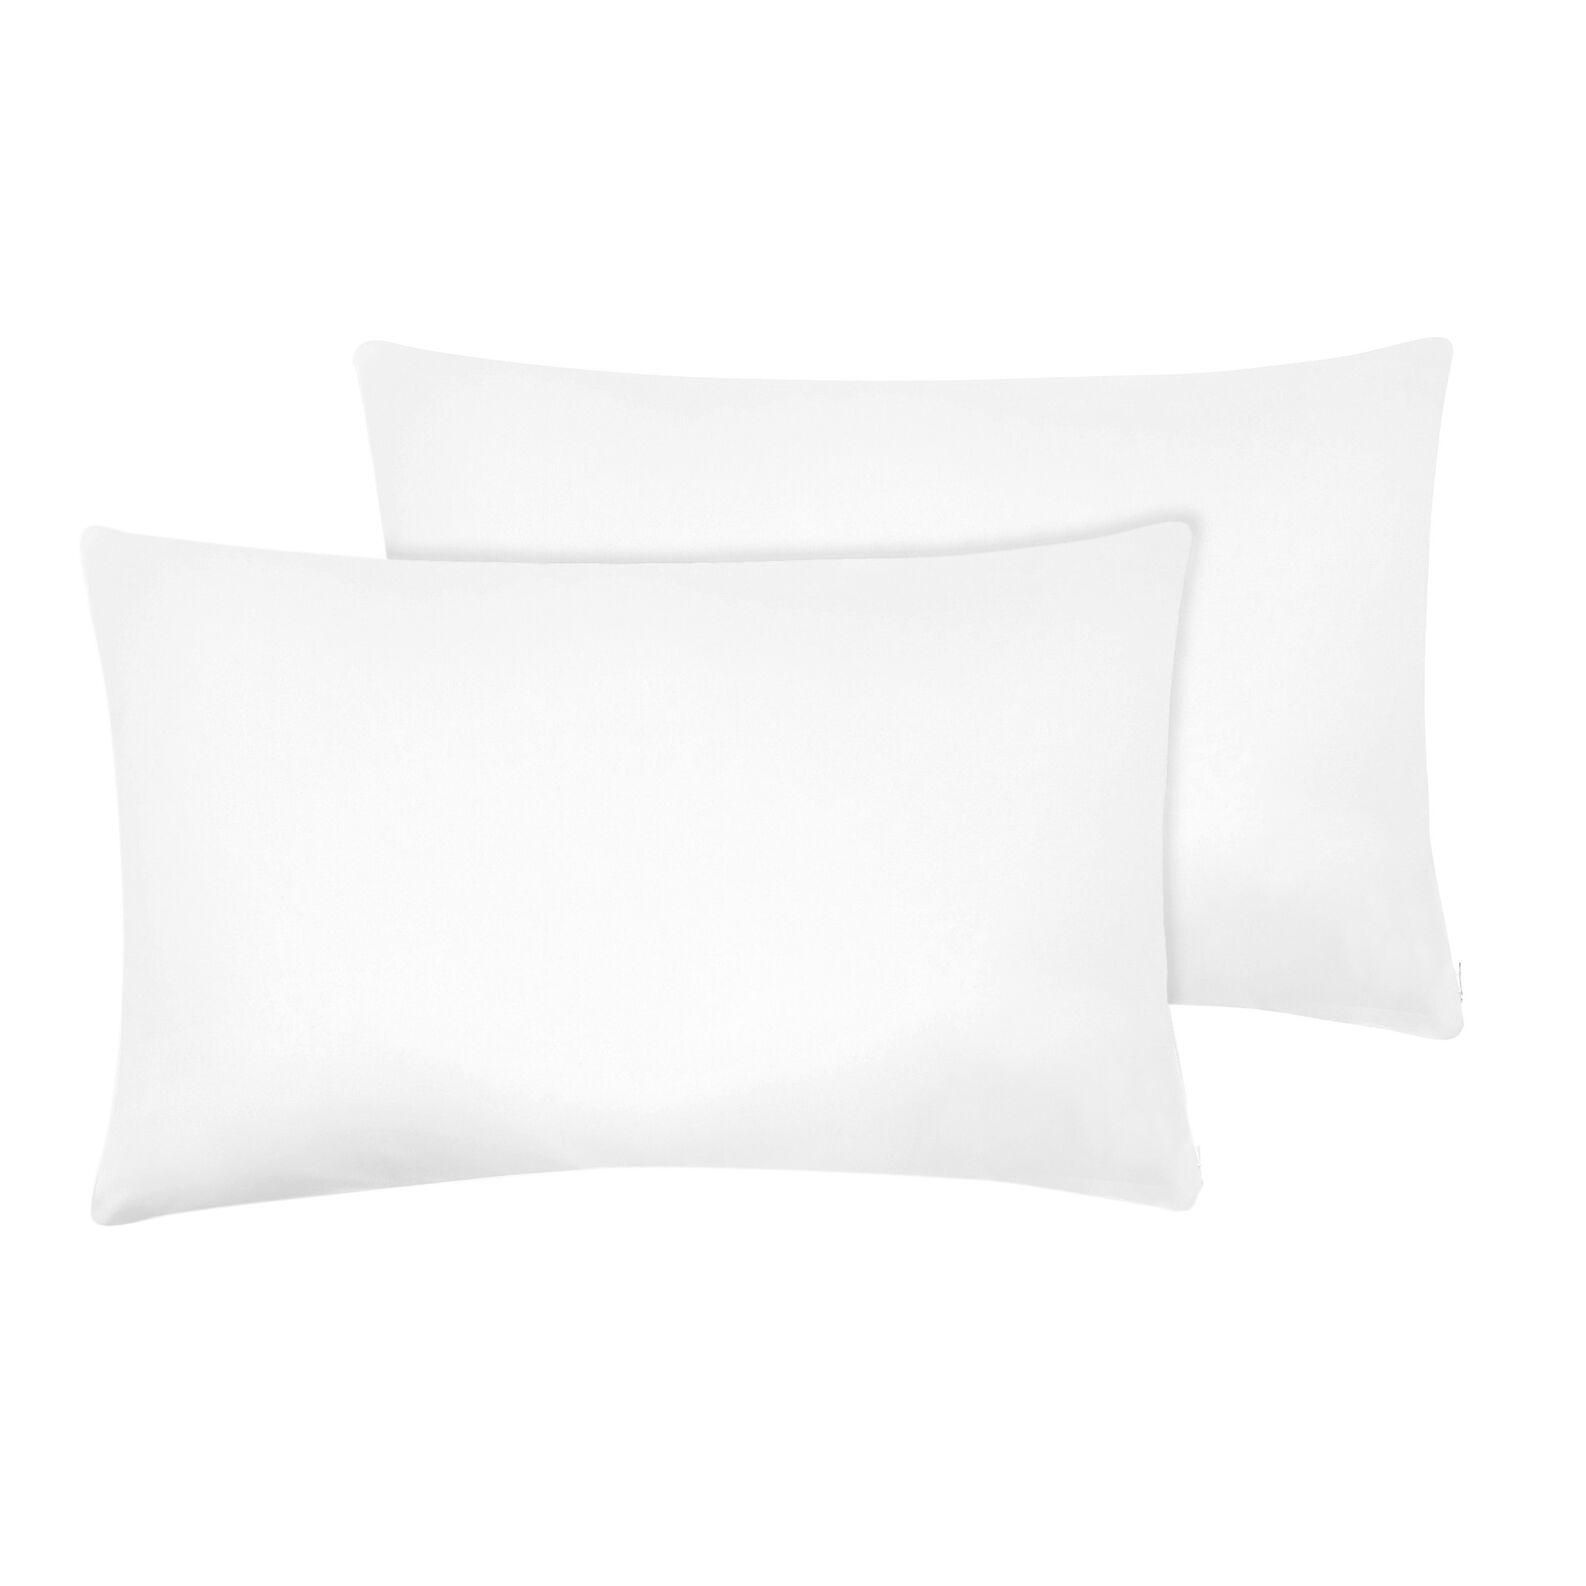 Pair of microfibre pillowcases